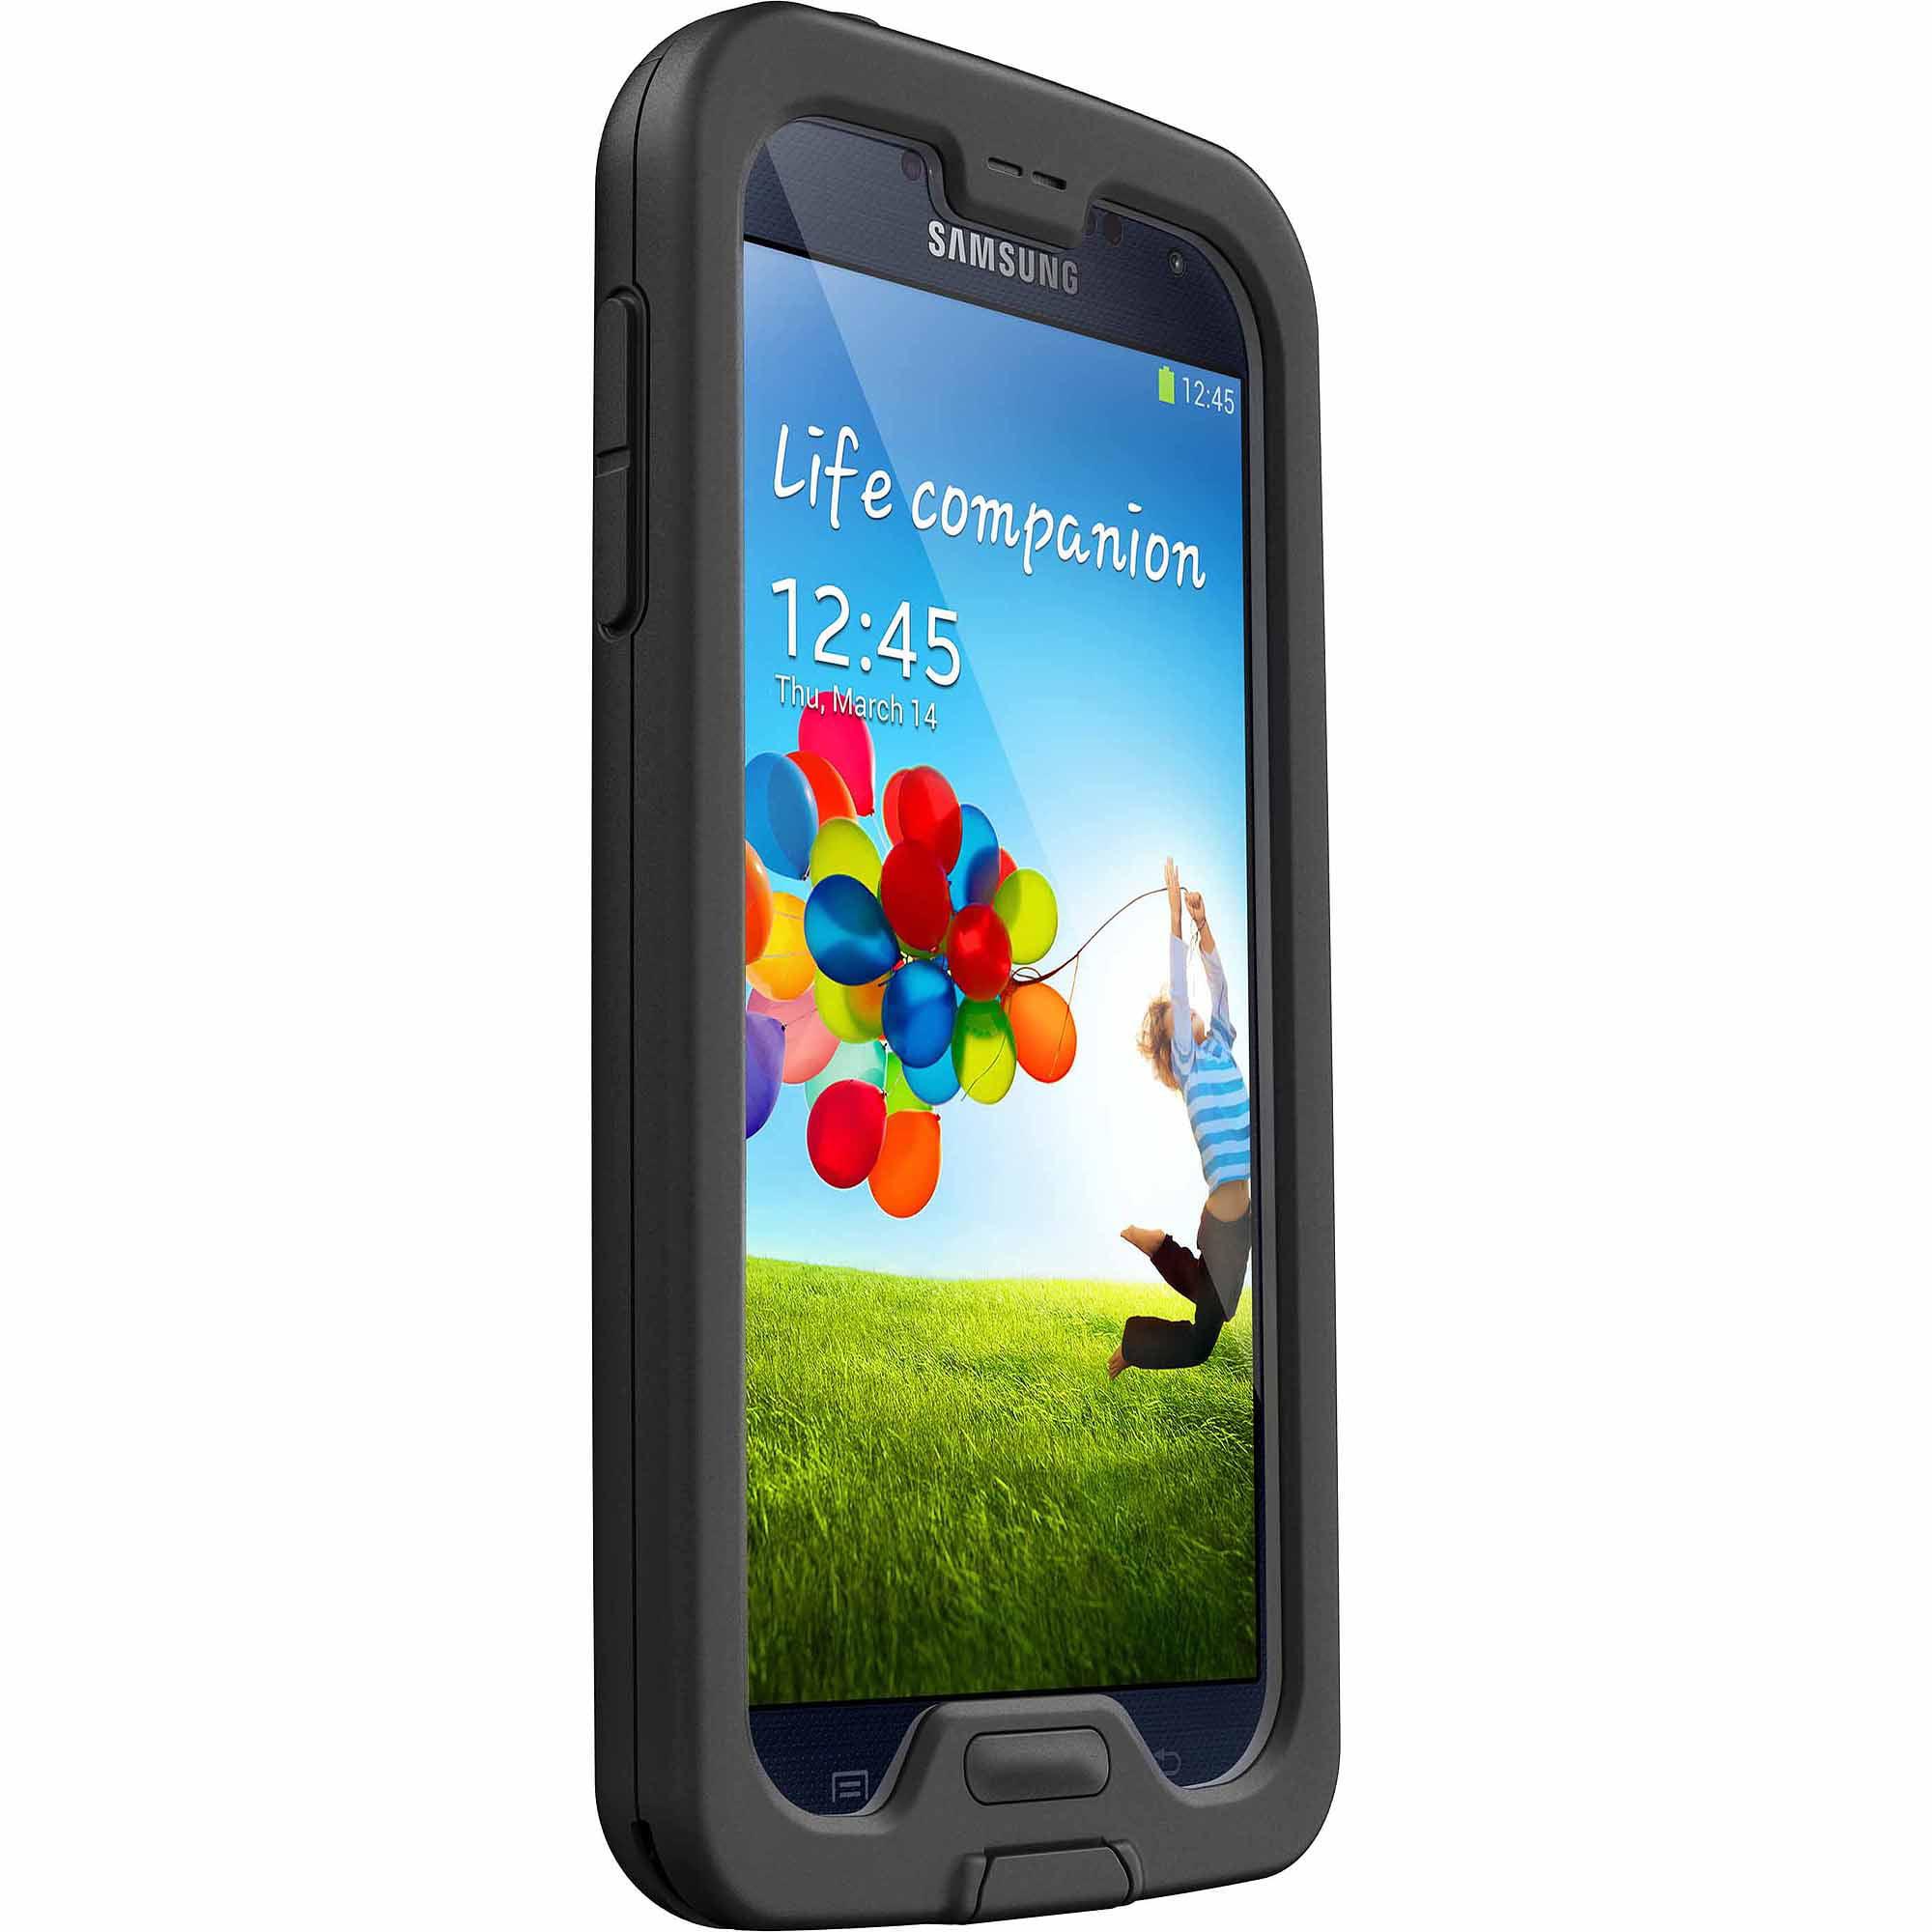 Notebook samsung galaxy s4 - Notebook Samsung Galaxy S4 17